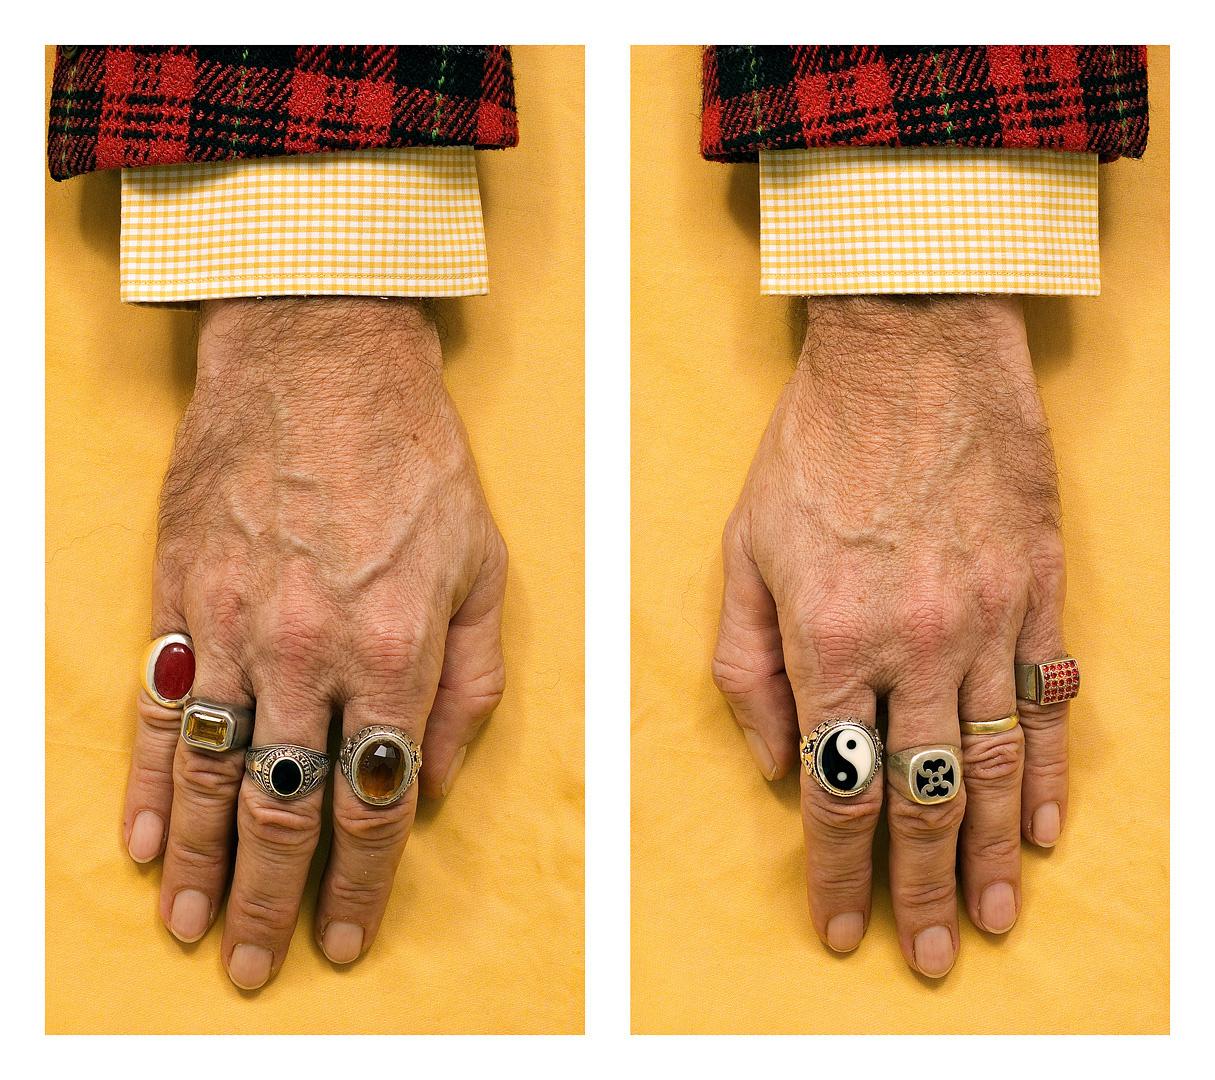 palms 02    2006    31.5X28 cm    c-print